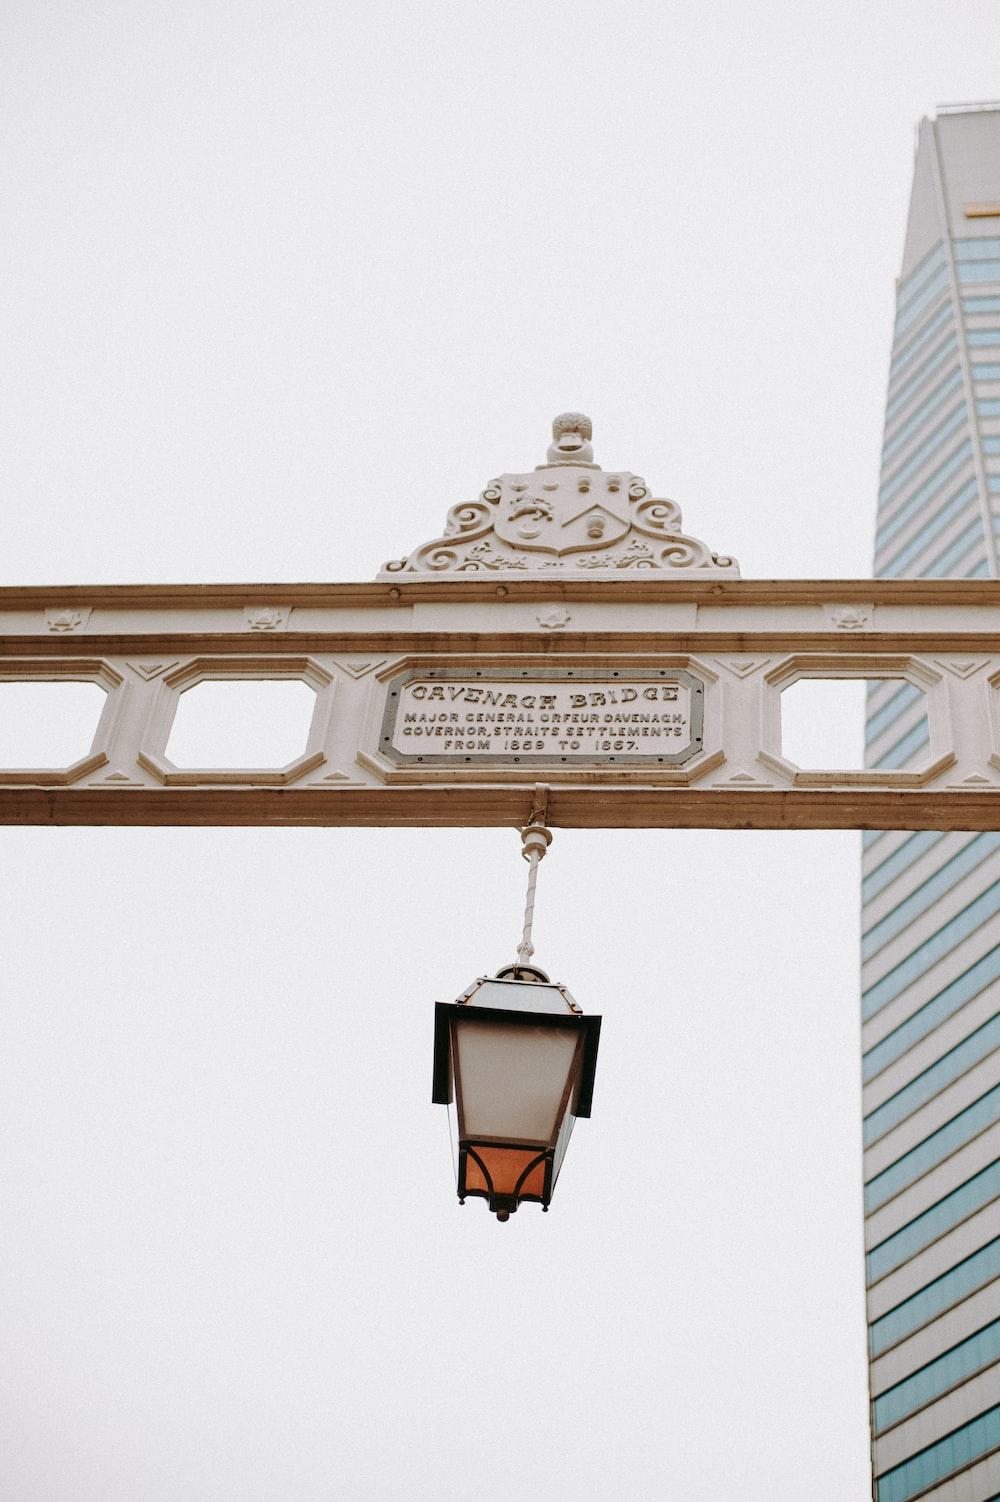 pendant lamp near building